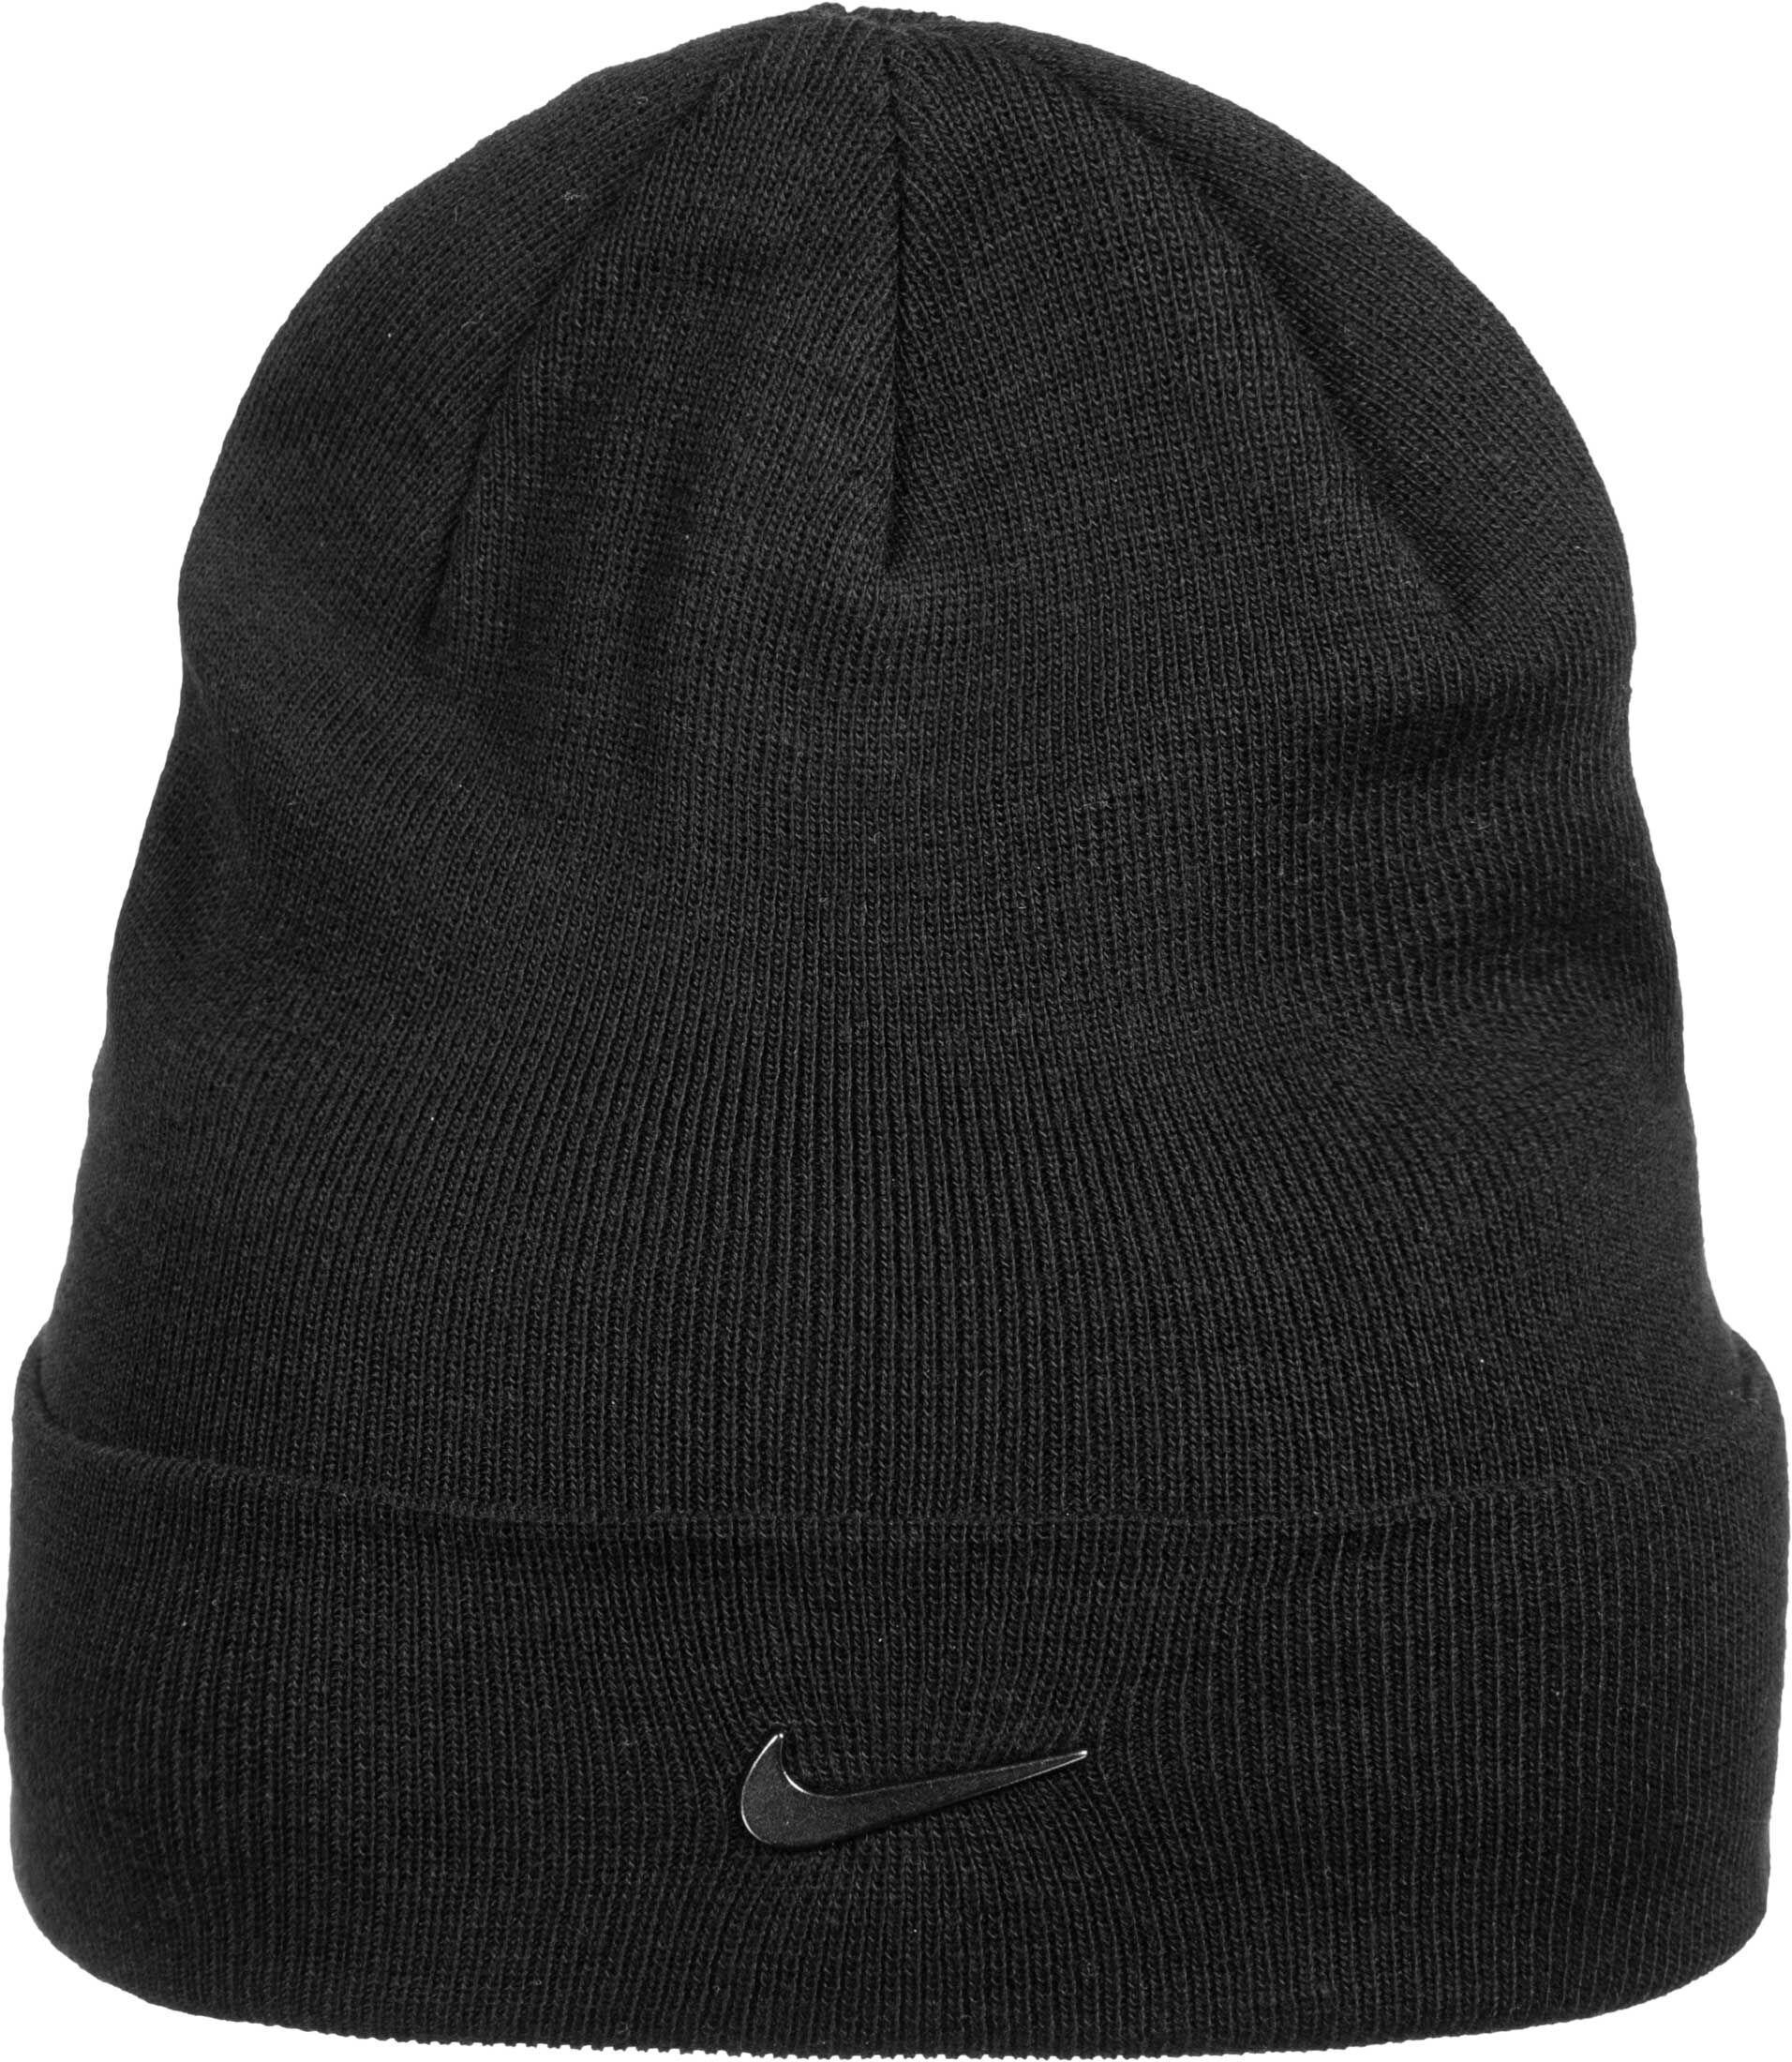 Nike bonnet enfants, One Size, enfant, noir